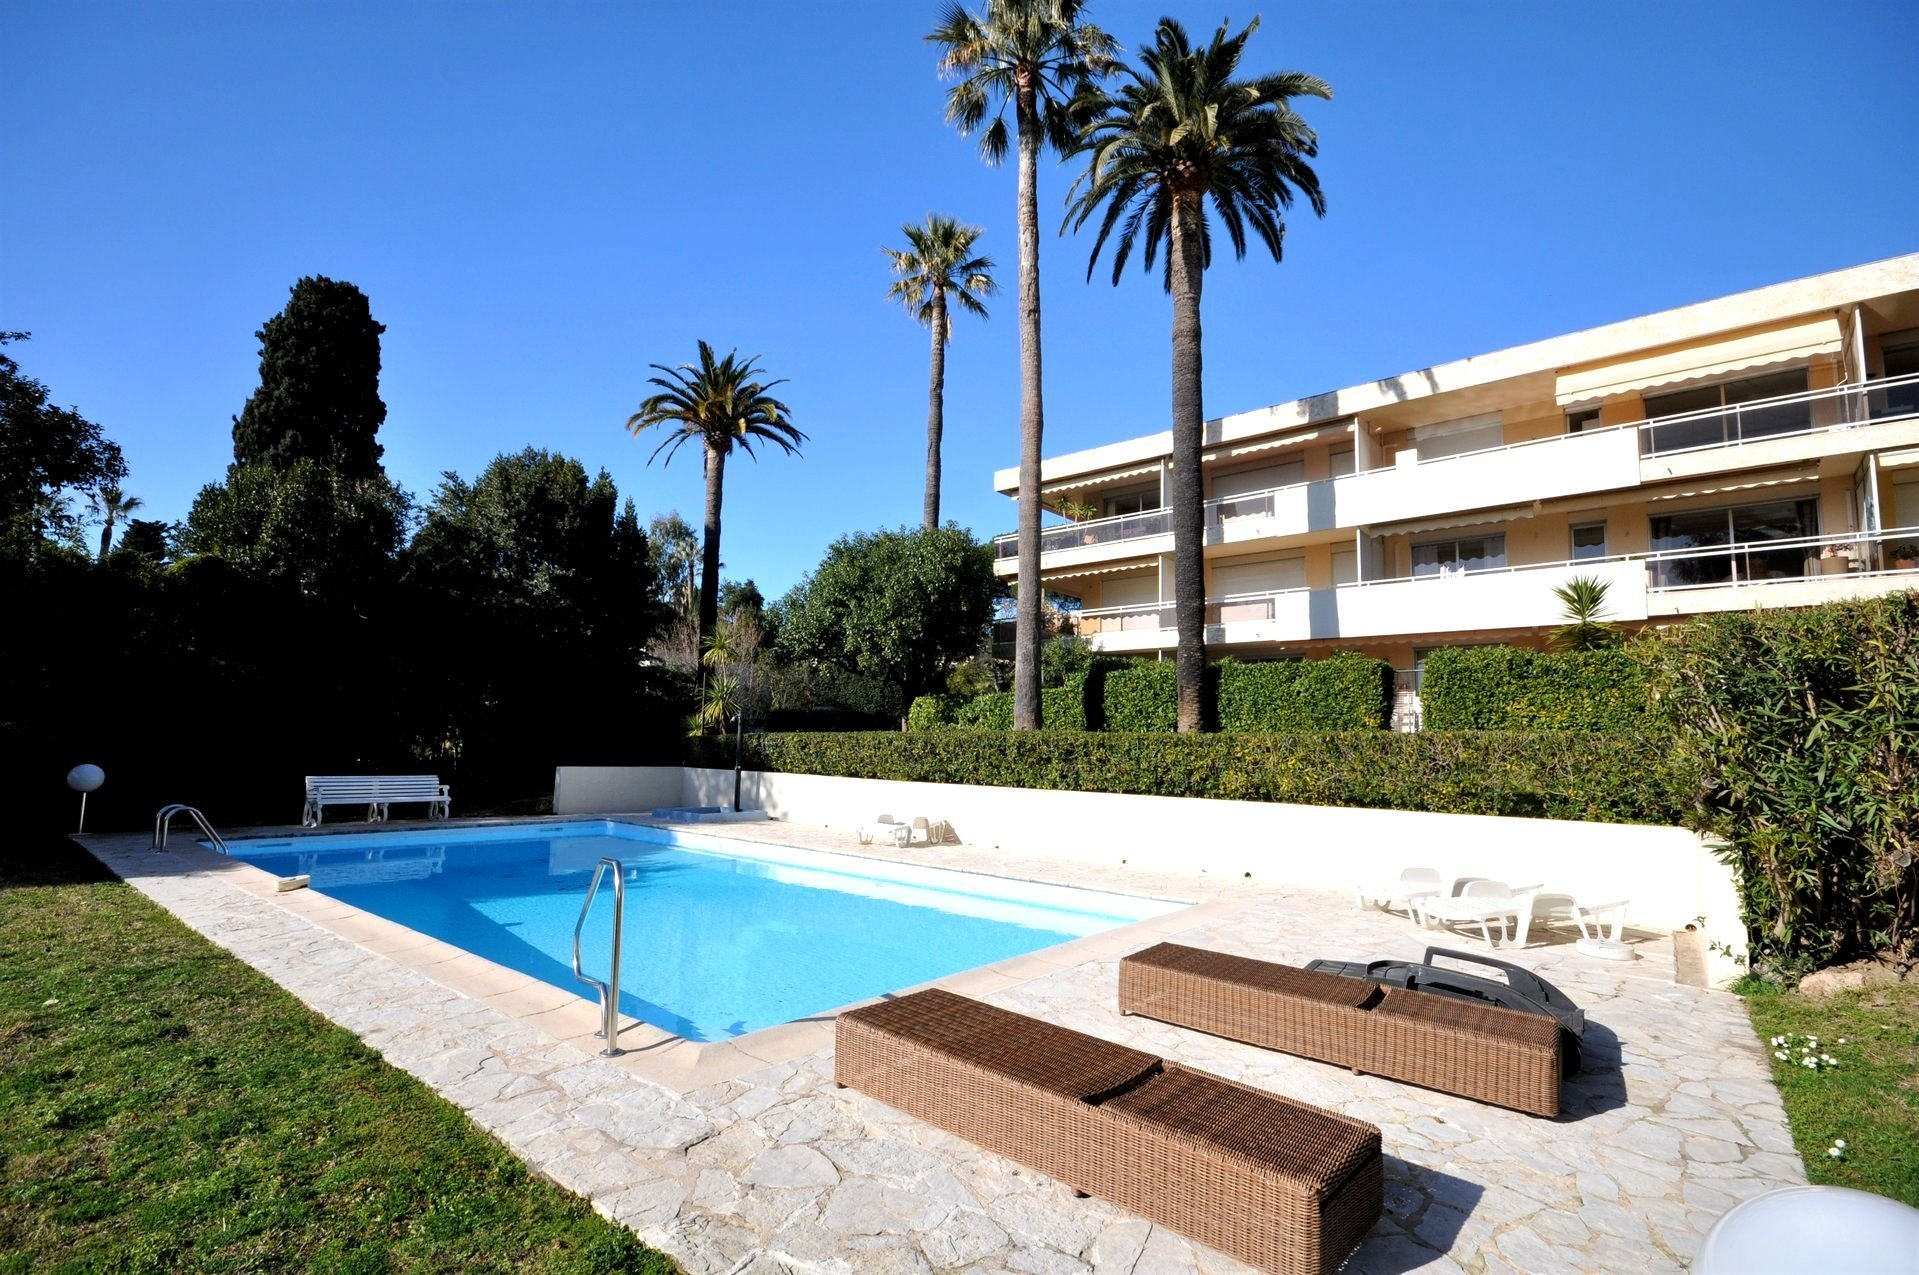 Vendita Appartamento - Cannes Basse Californie - Francia